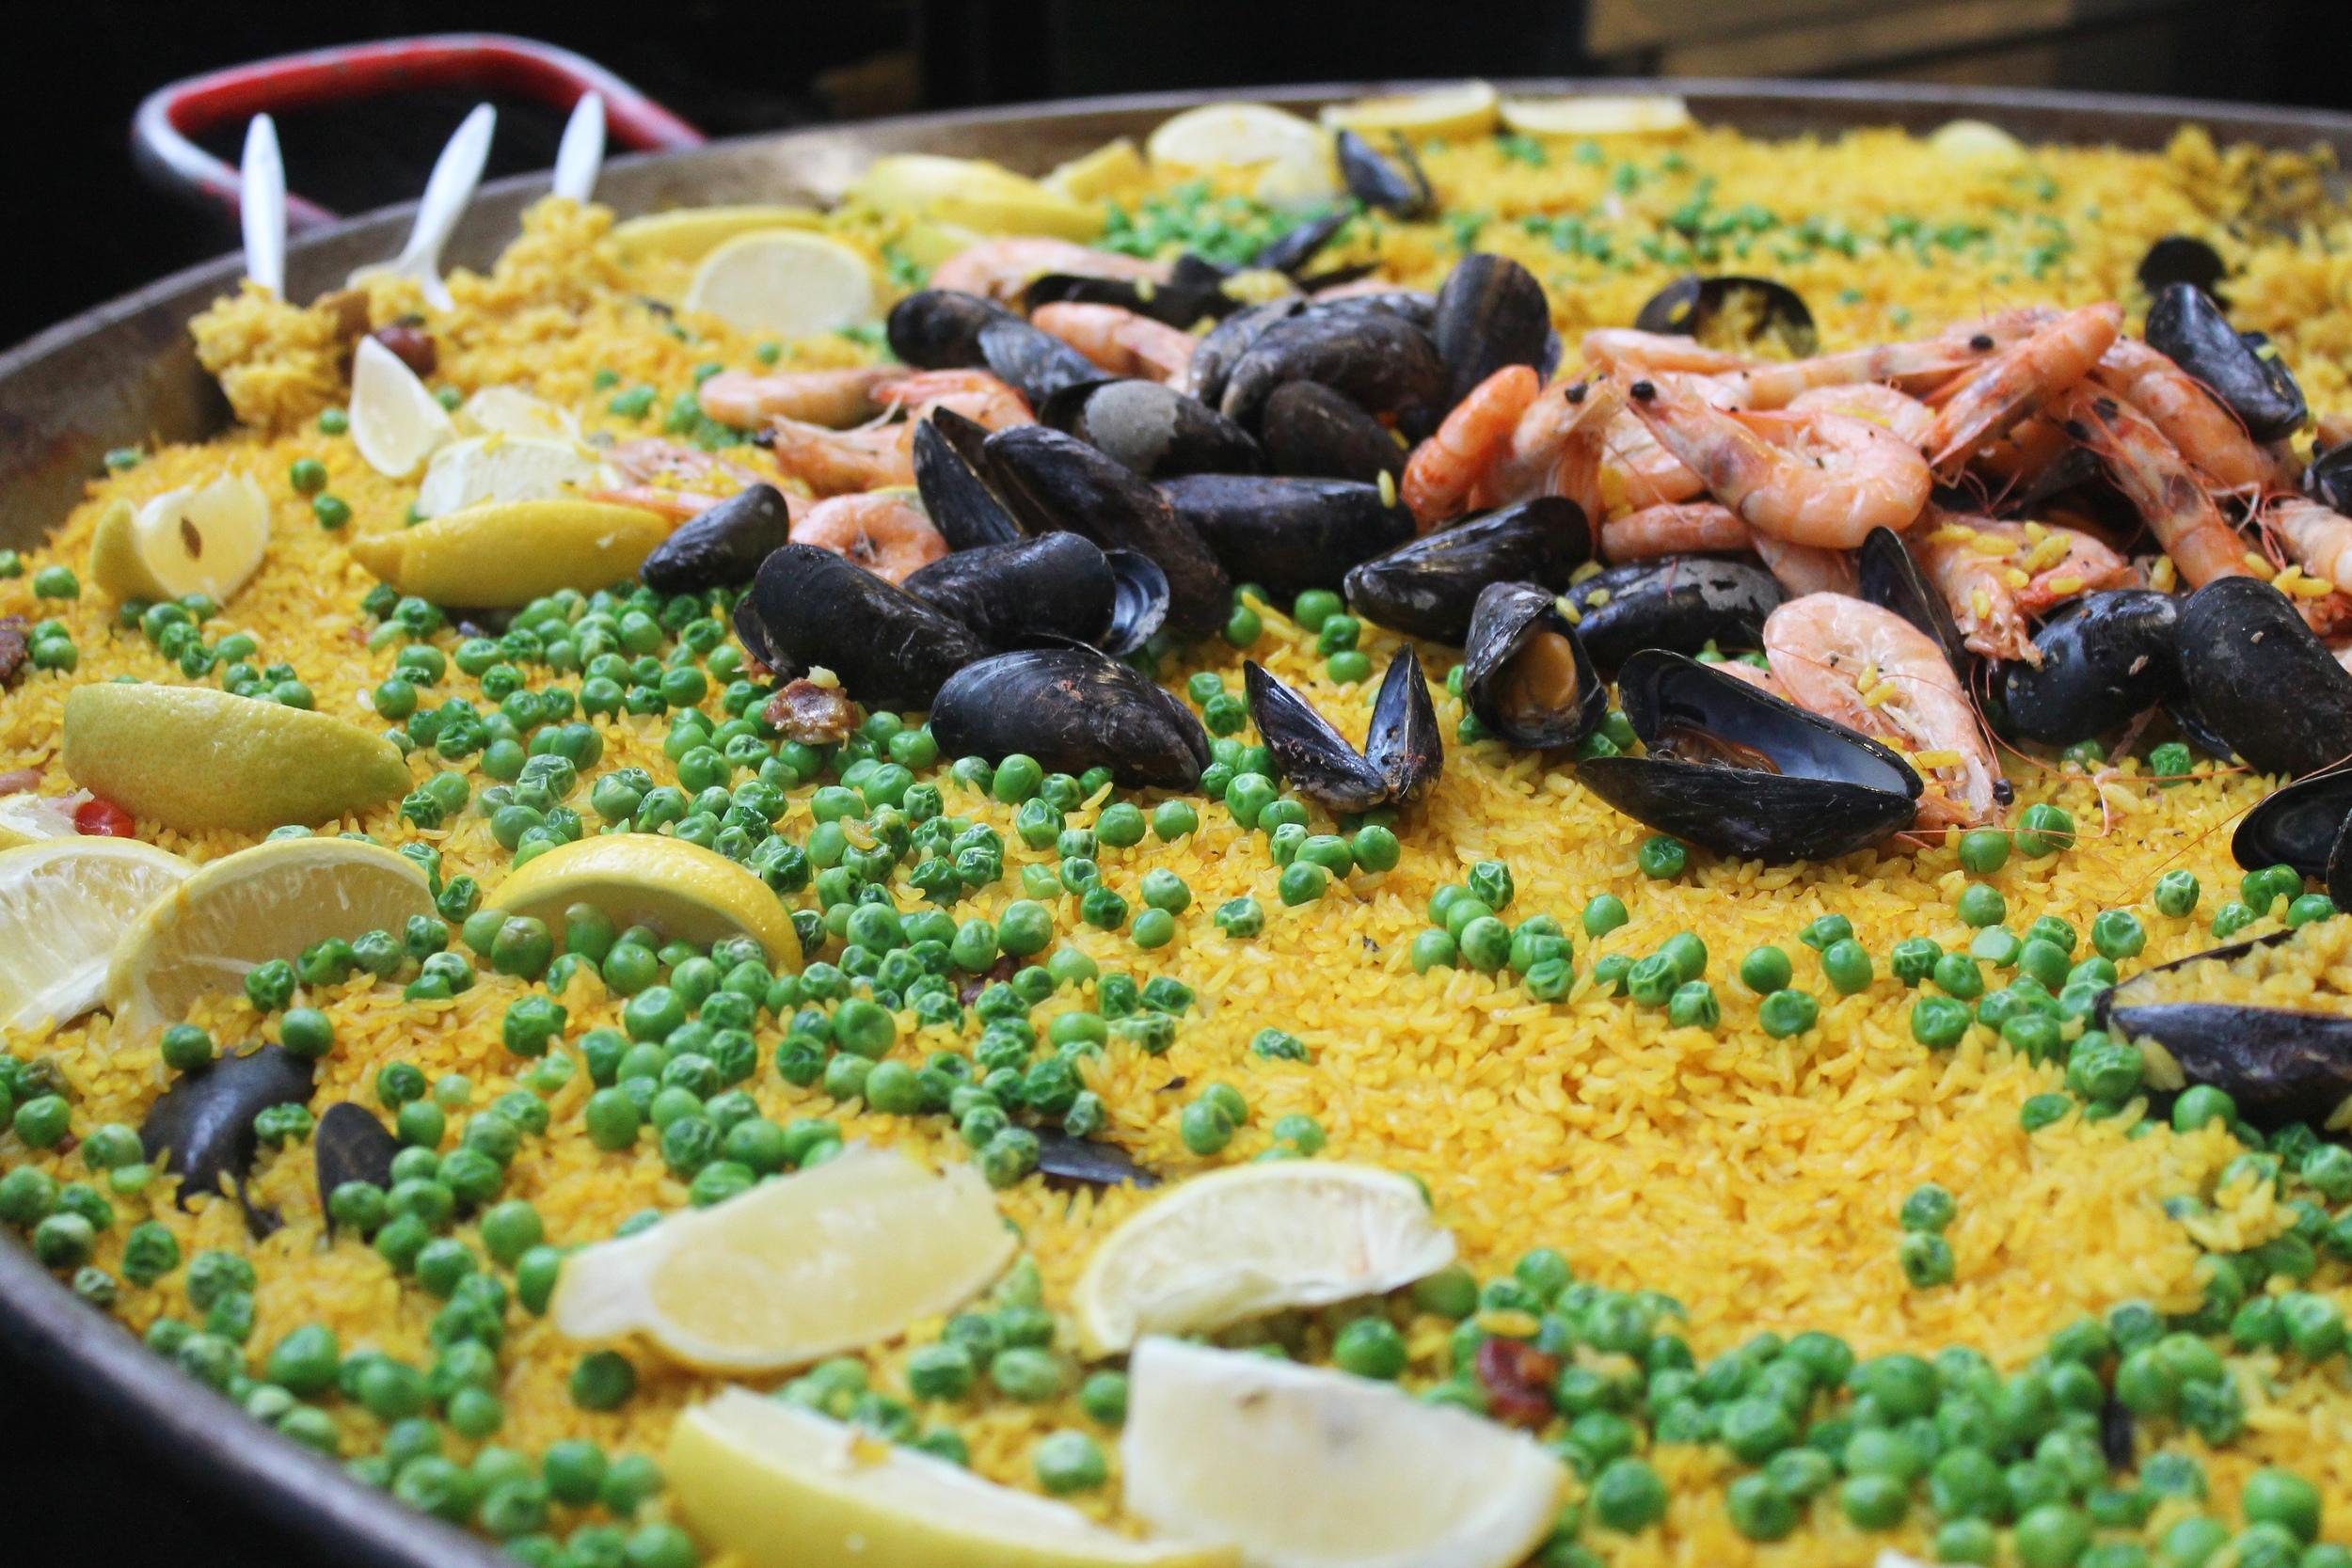 Furness Food's bomba paella